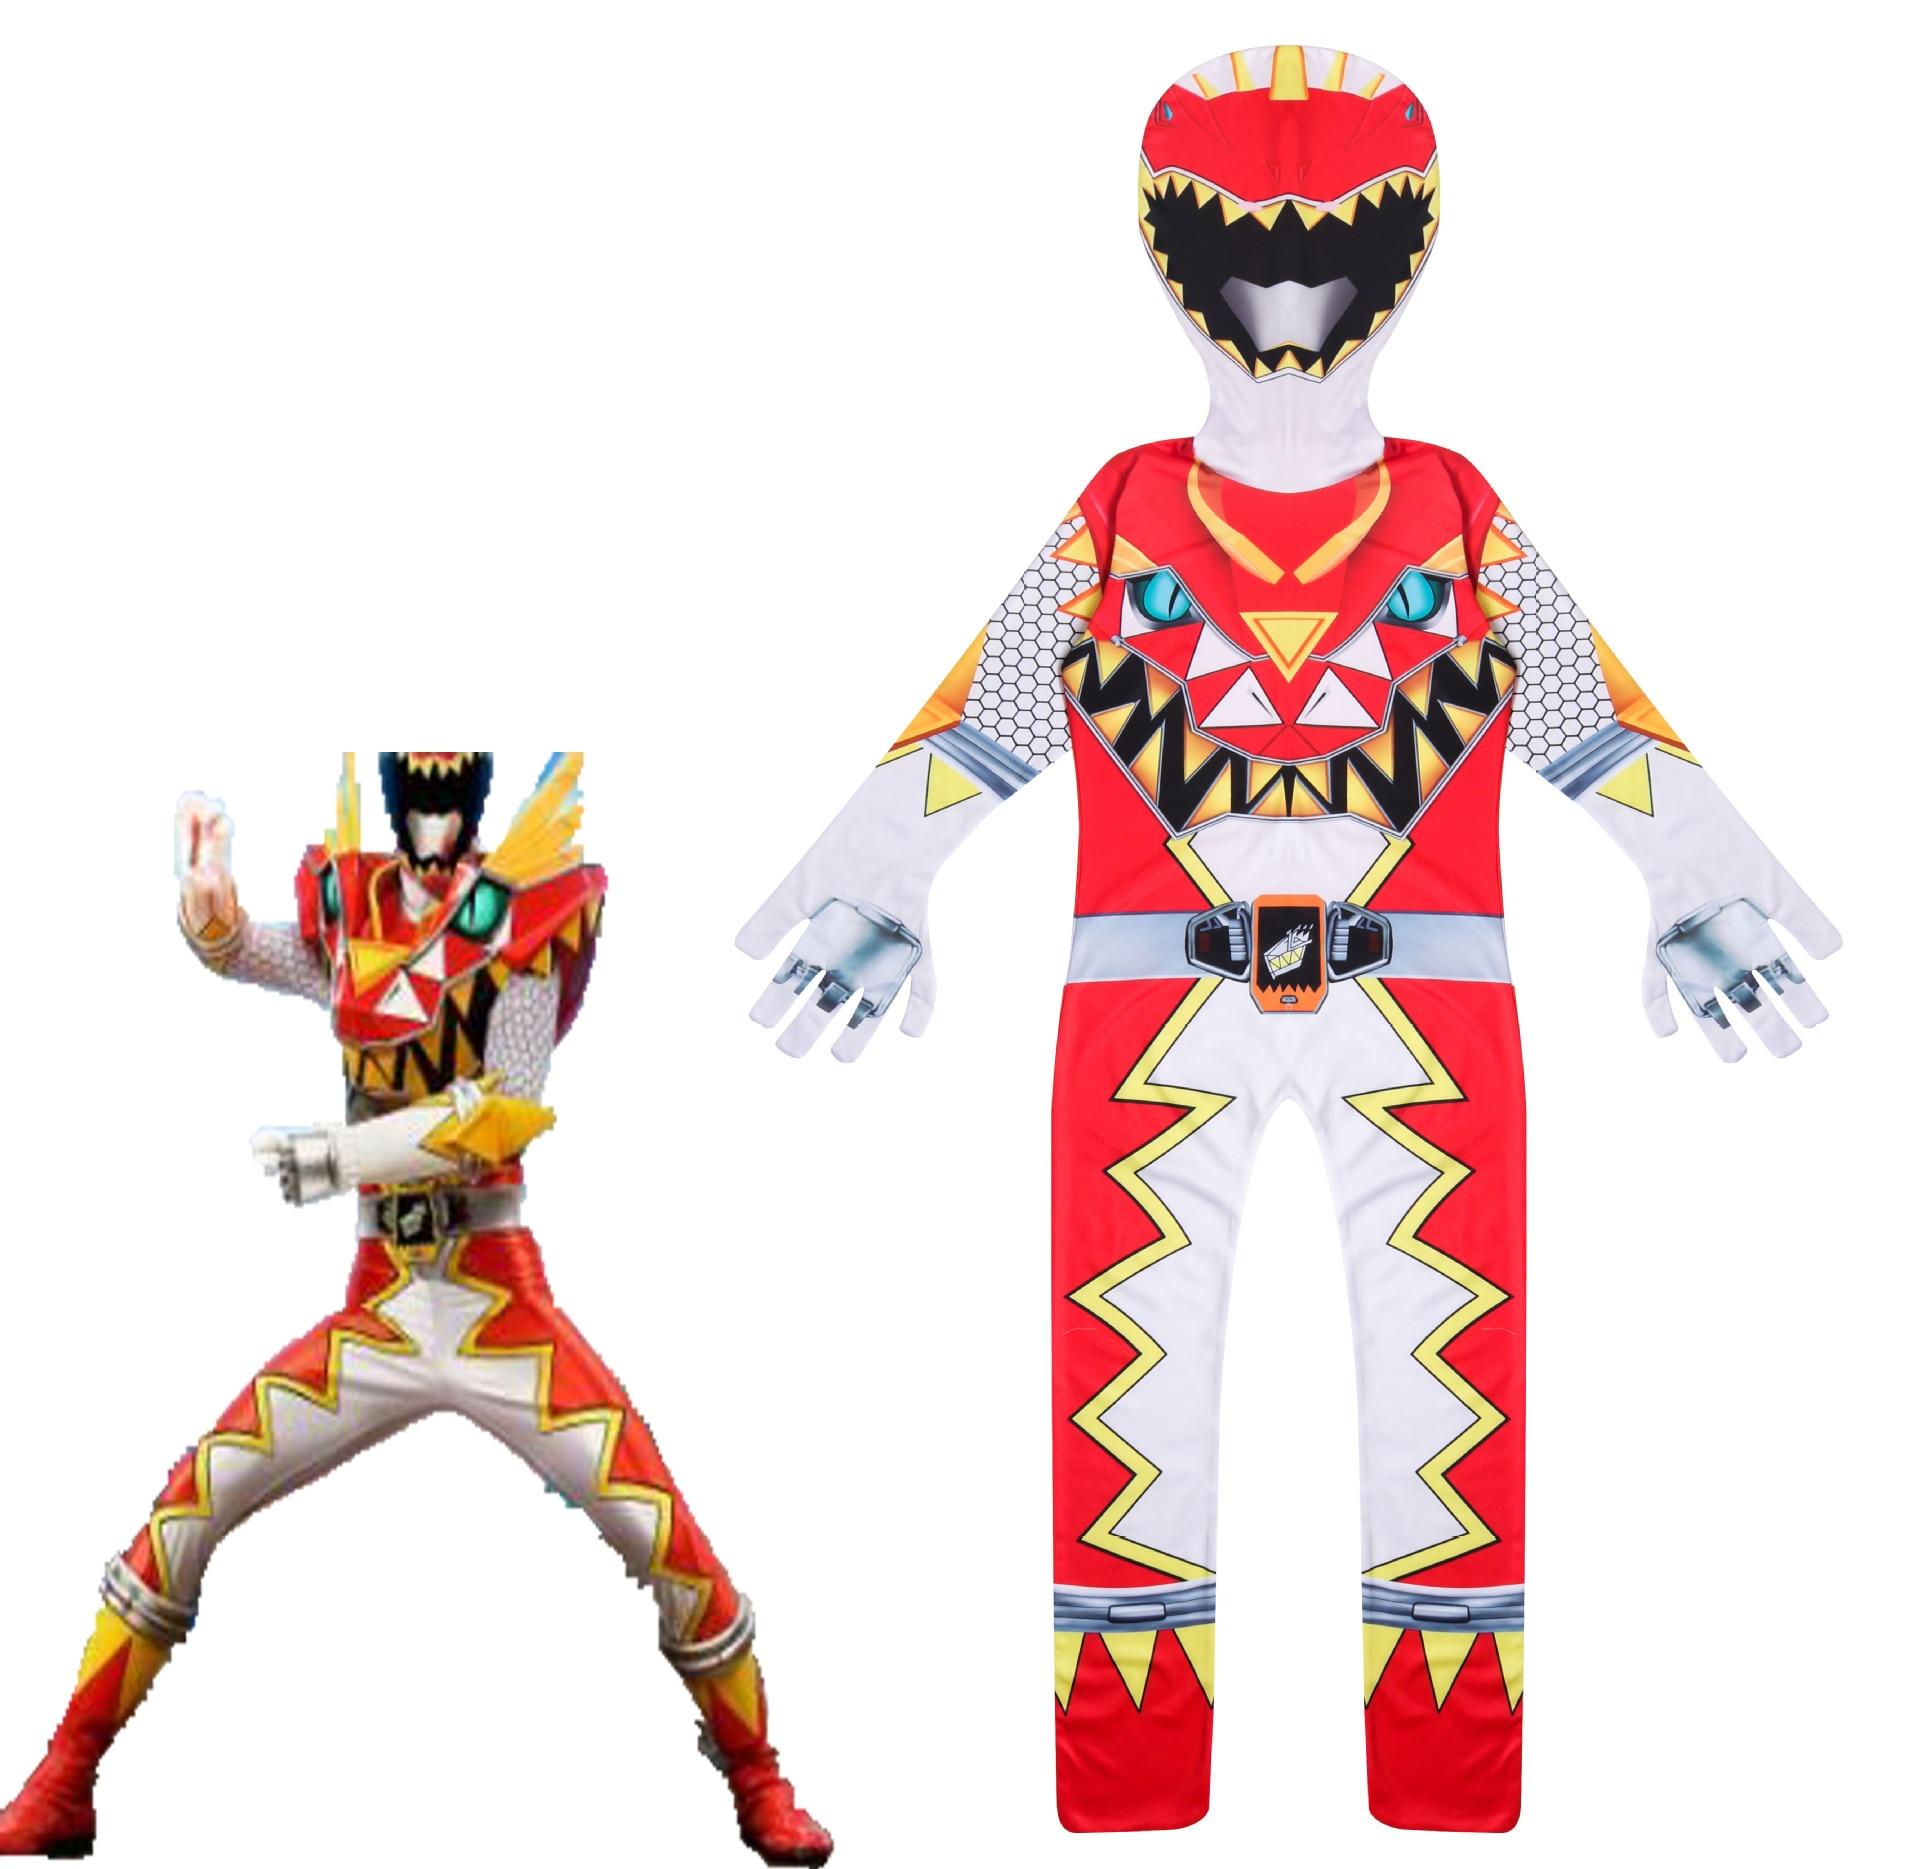 Boys Cosplay Jumpsuits Halloween Costumes Extraordinary Power Mecha Five Beast Super Action Figures Rangers Battle Team Force